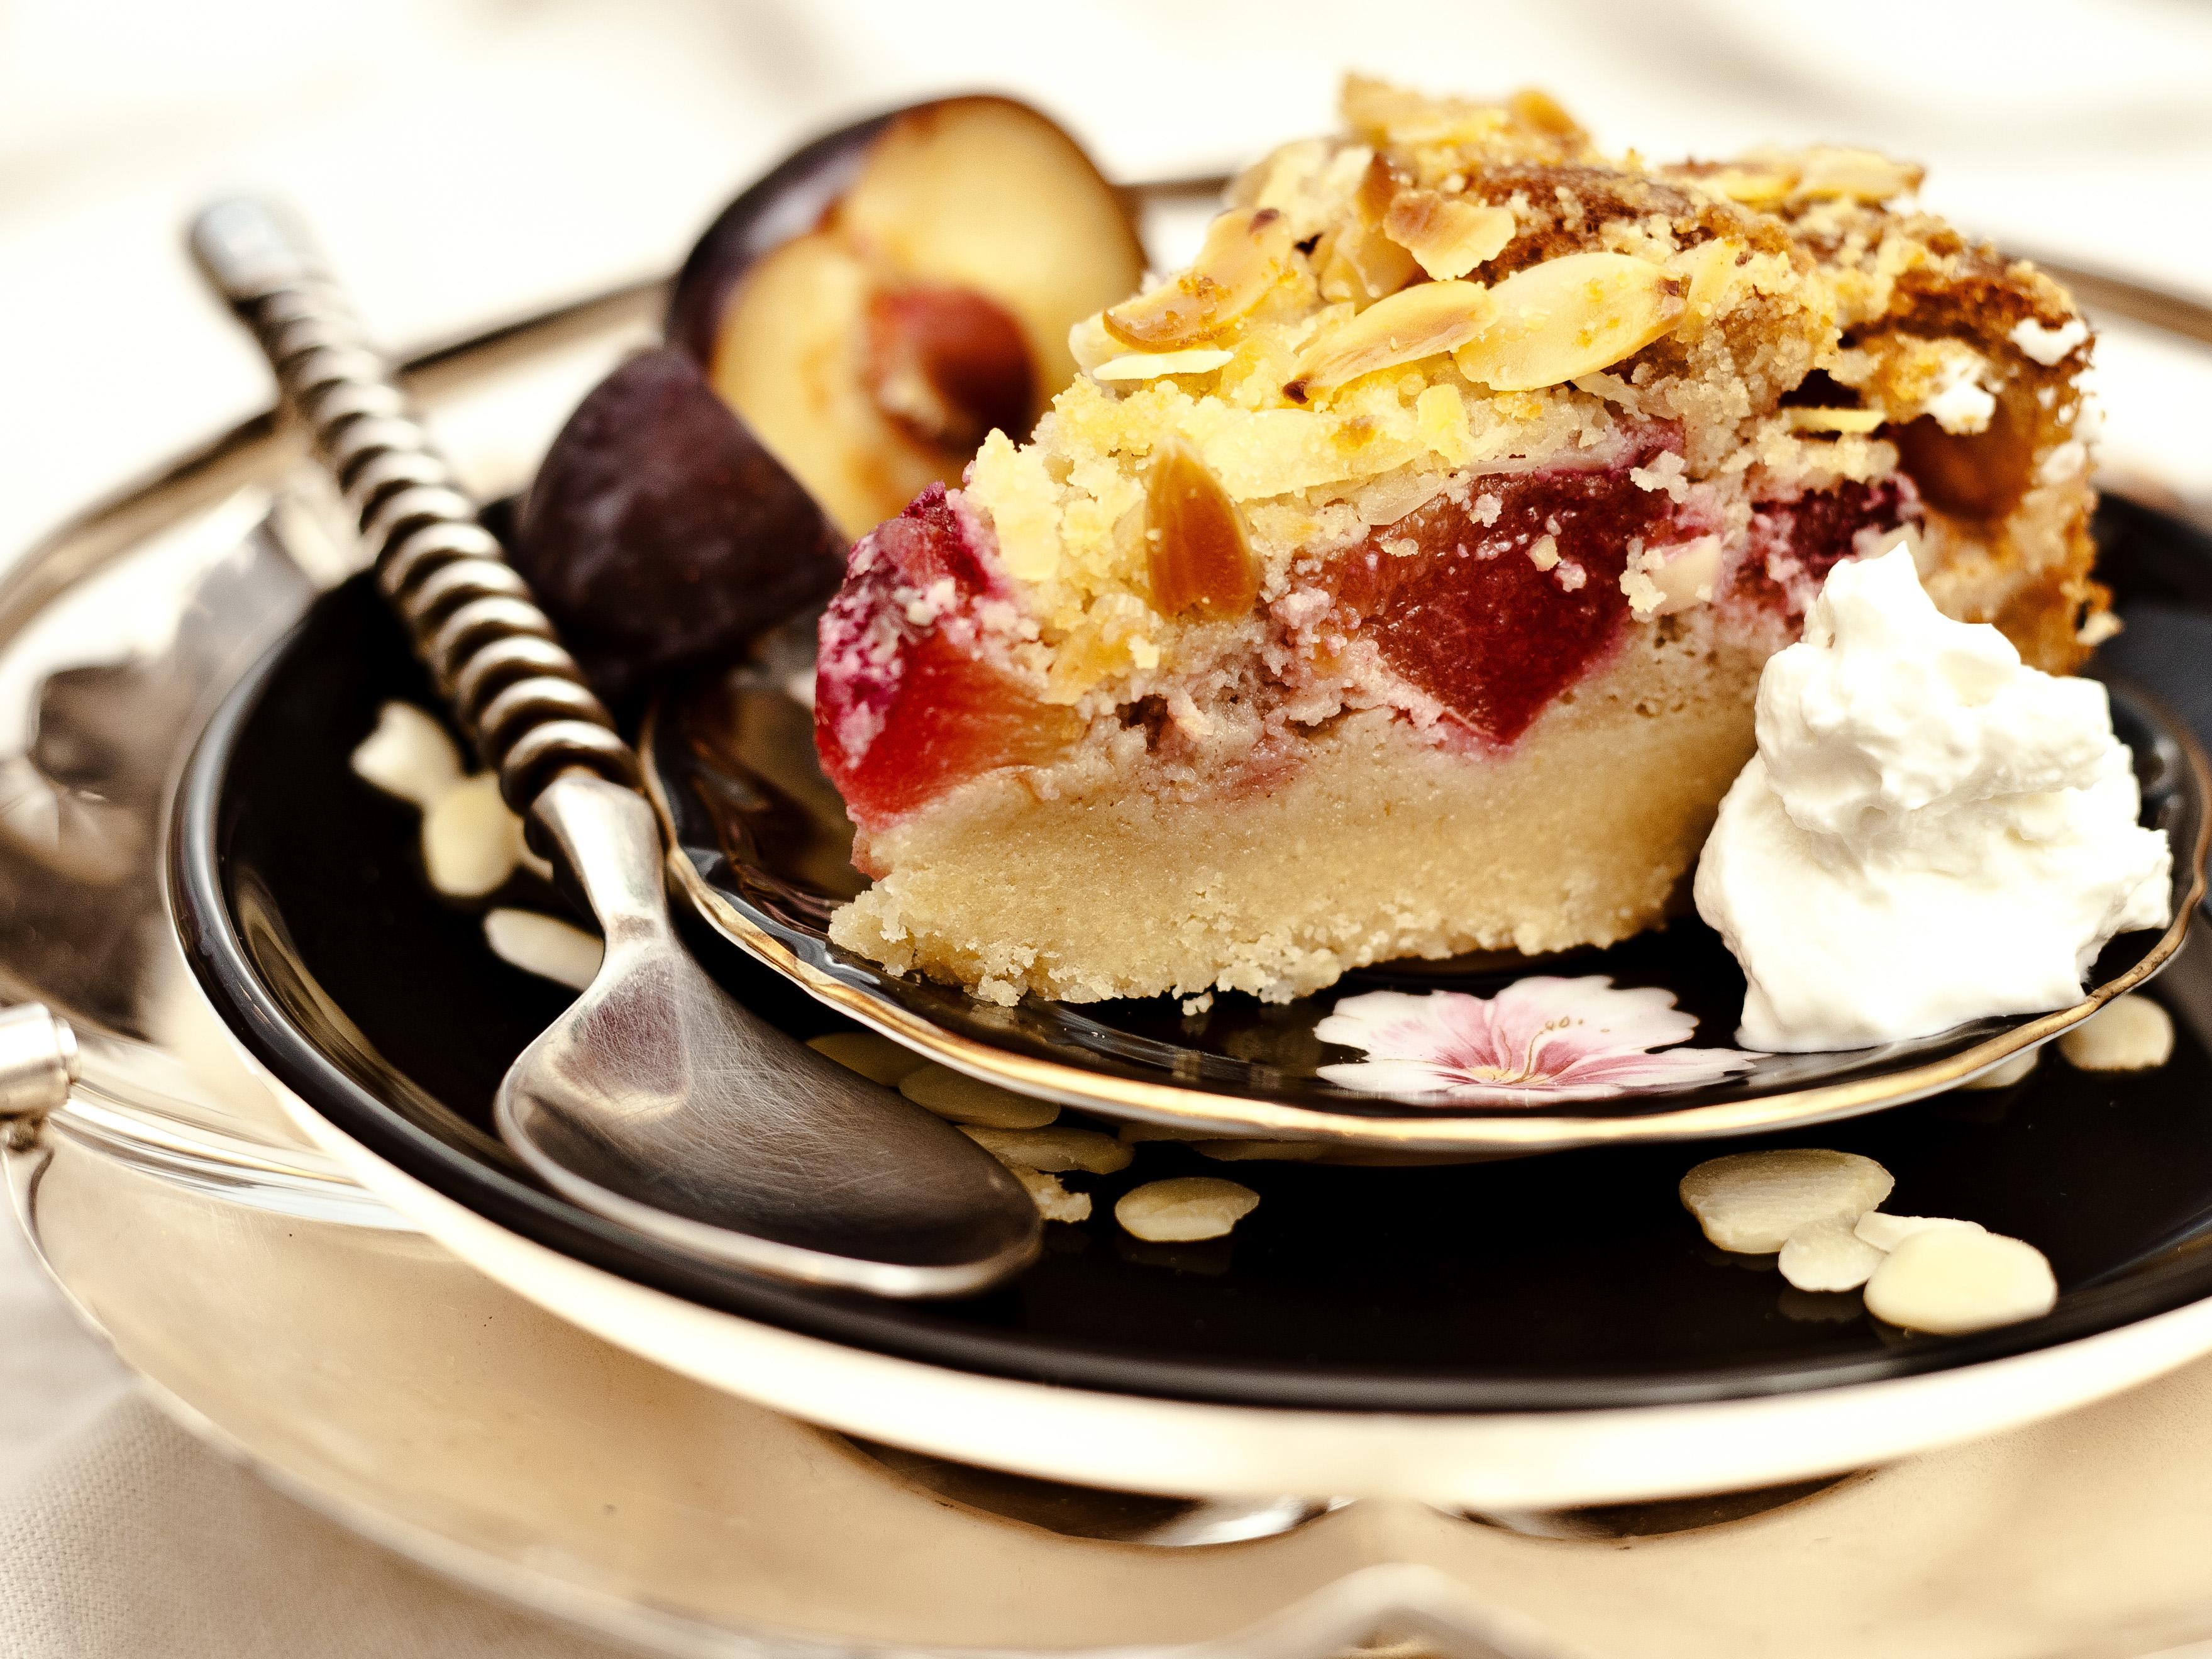 Plum & Almond Crumble Cake